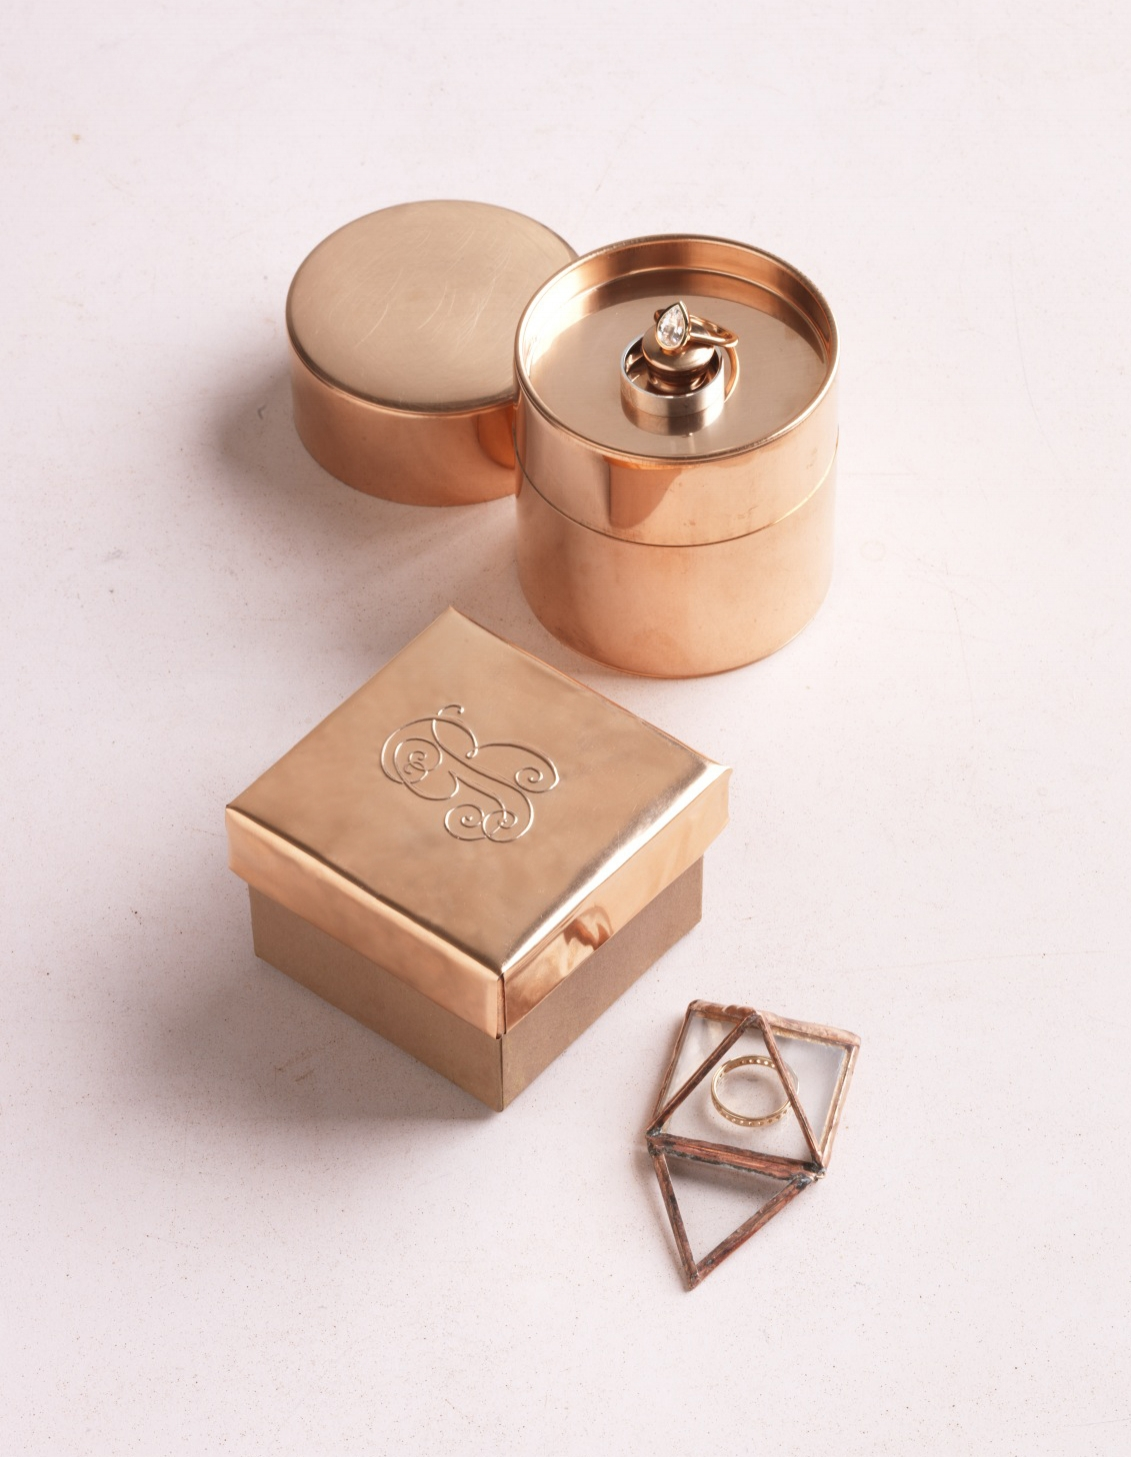 copper-ring-box-0032-d111902.jpg